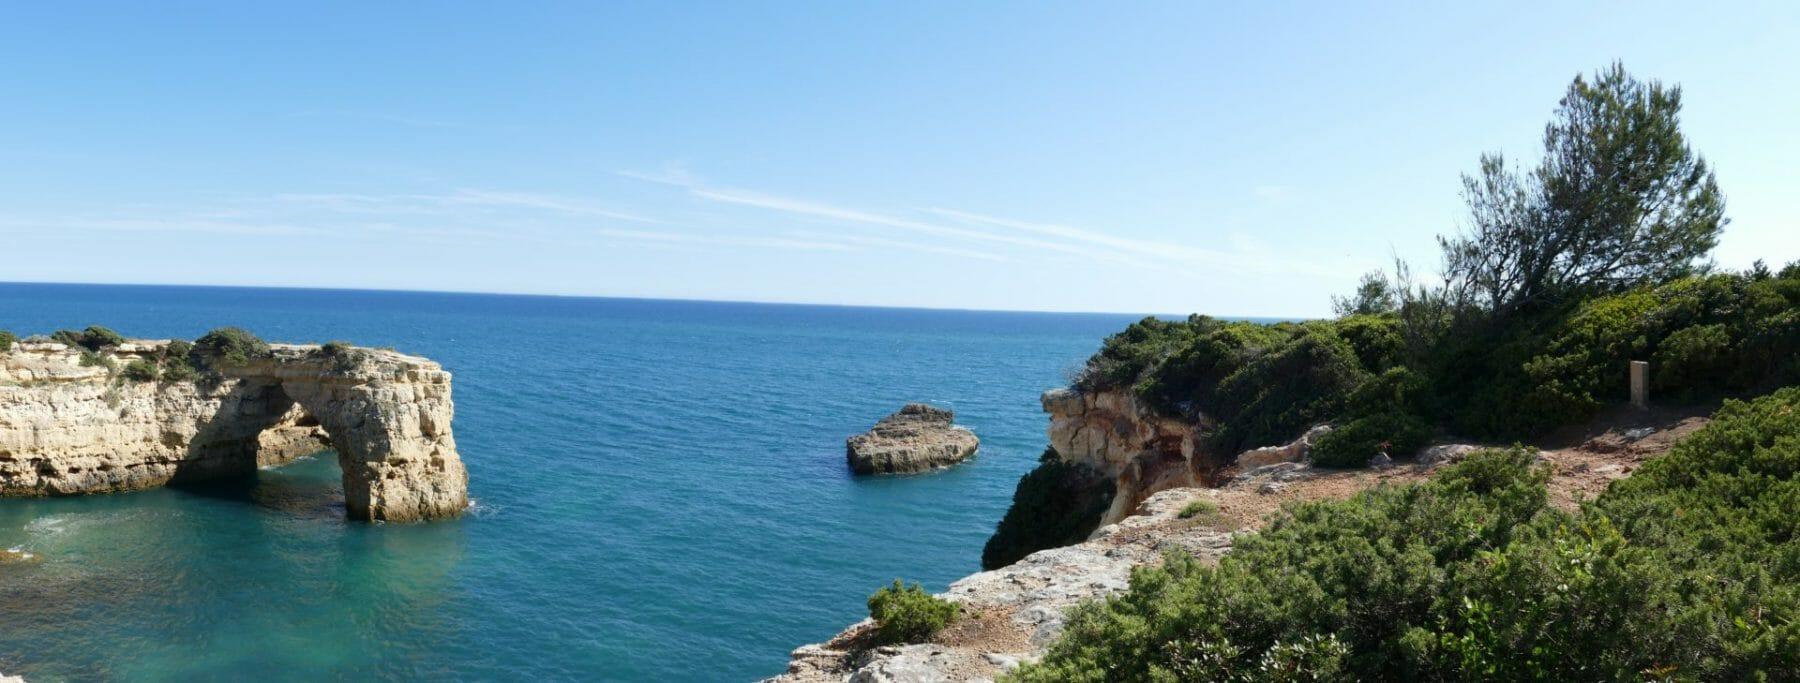 Klippenbogen Praia de Albandeira im Herzen der Felsenalgarve